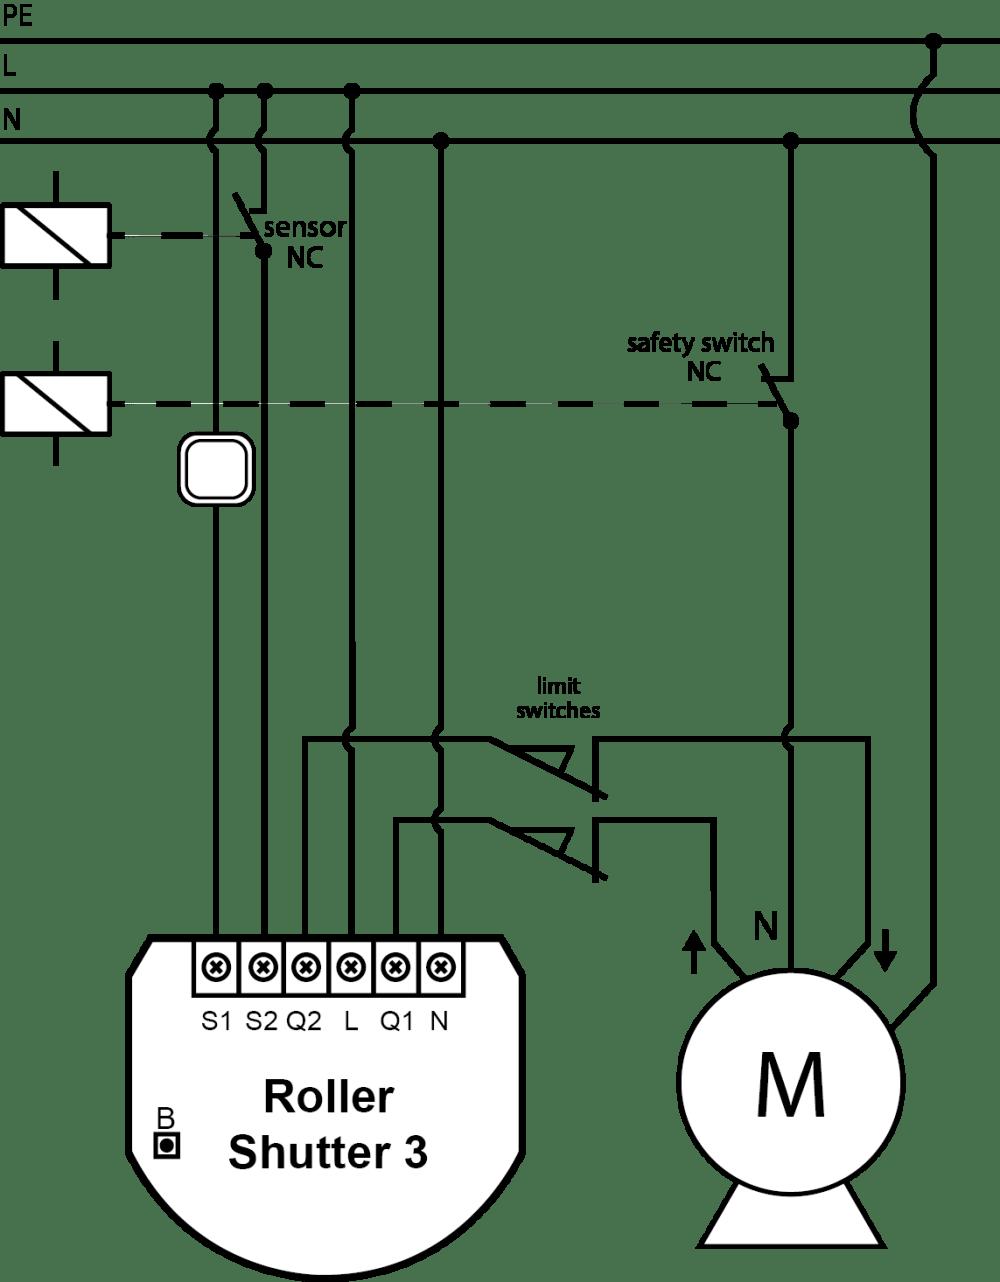 medium resolution of roller shutter 3 fibaro manuals rolling shutter motor control circuit diagram